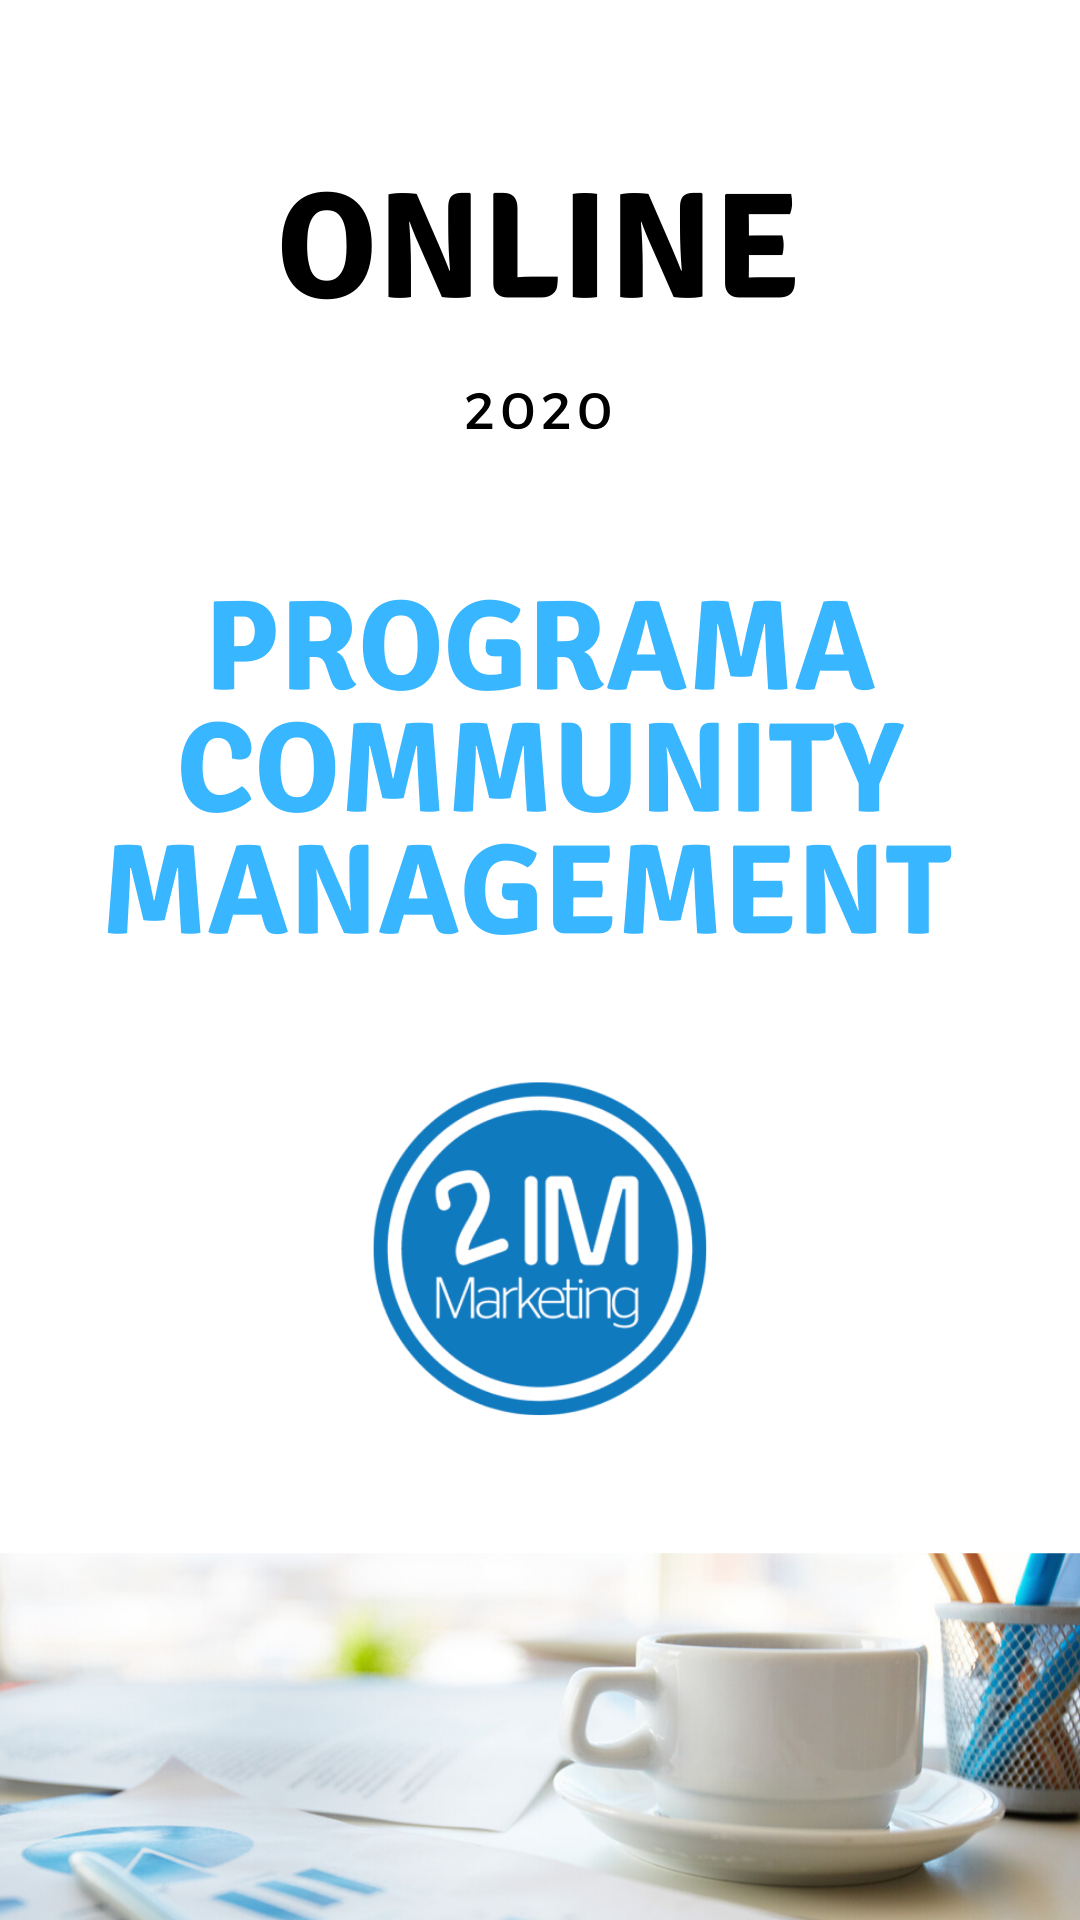 curso de community manager online